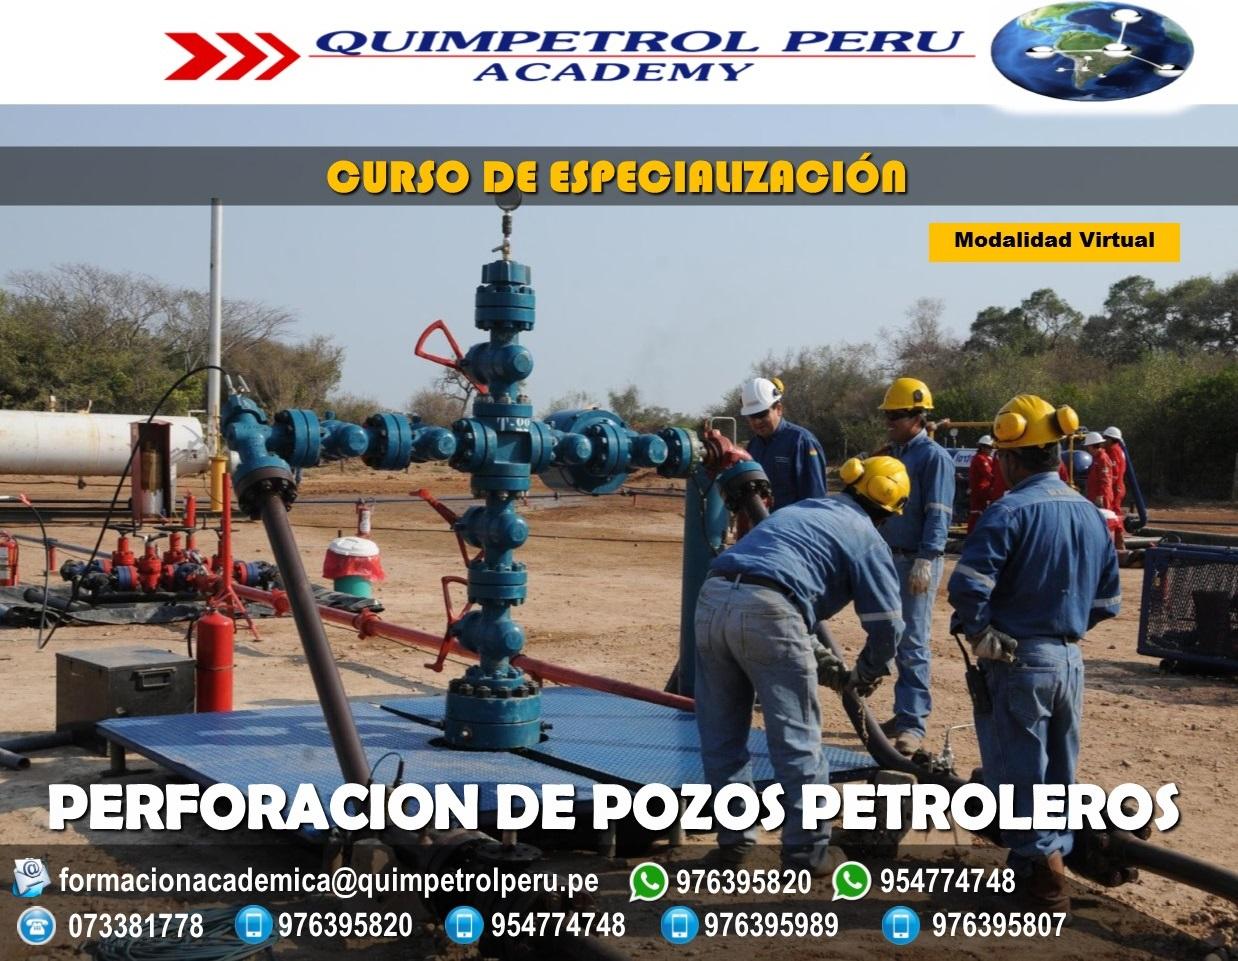 Curso de especialización: Perforación de pozos Petroleros